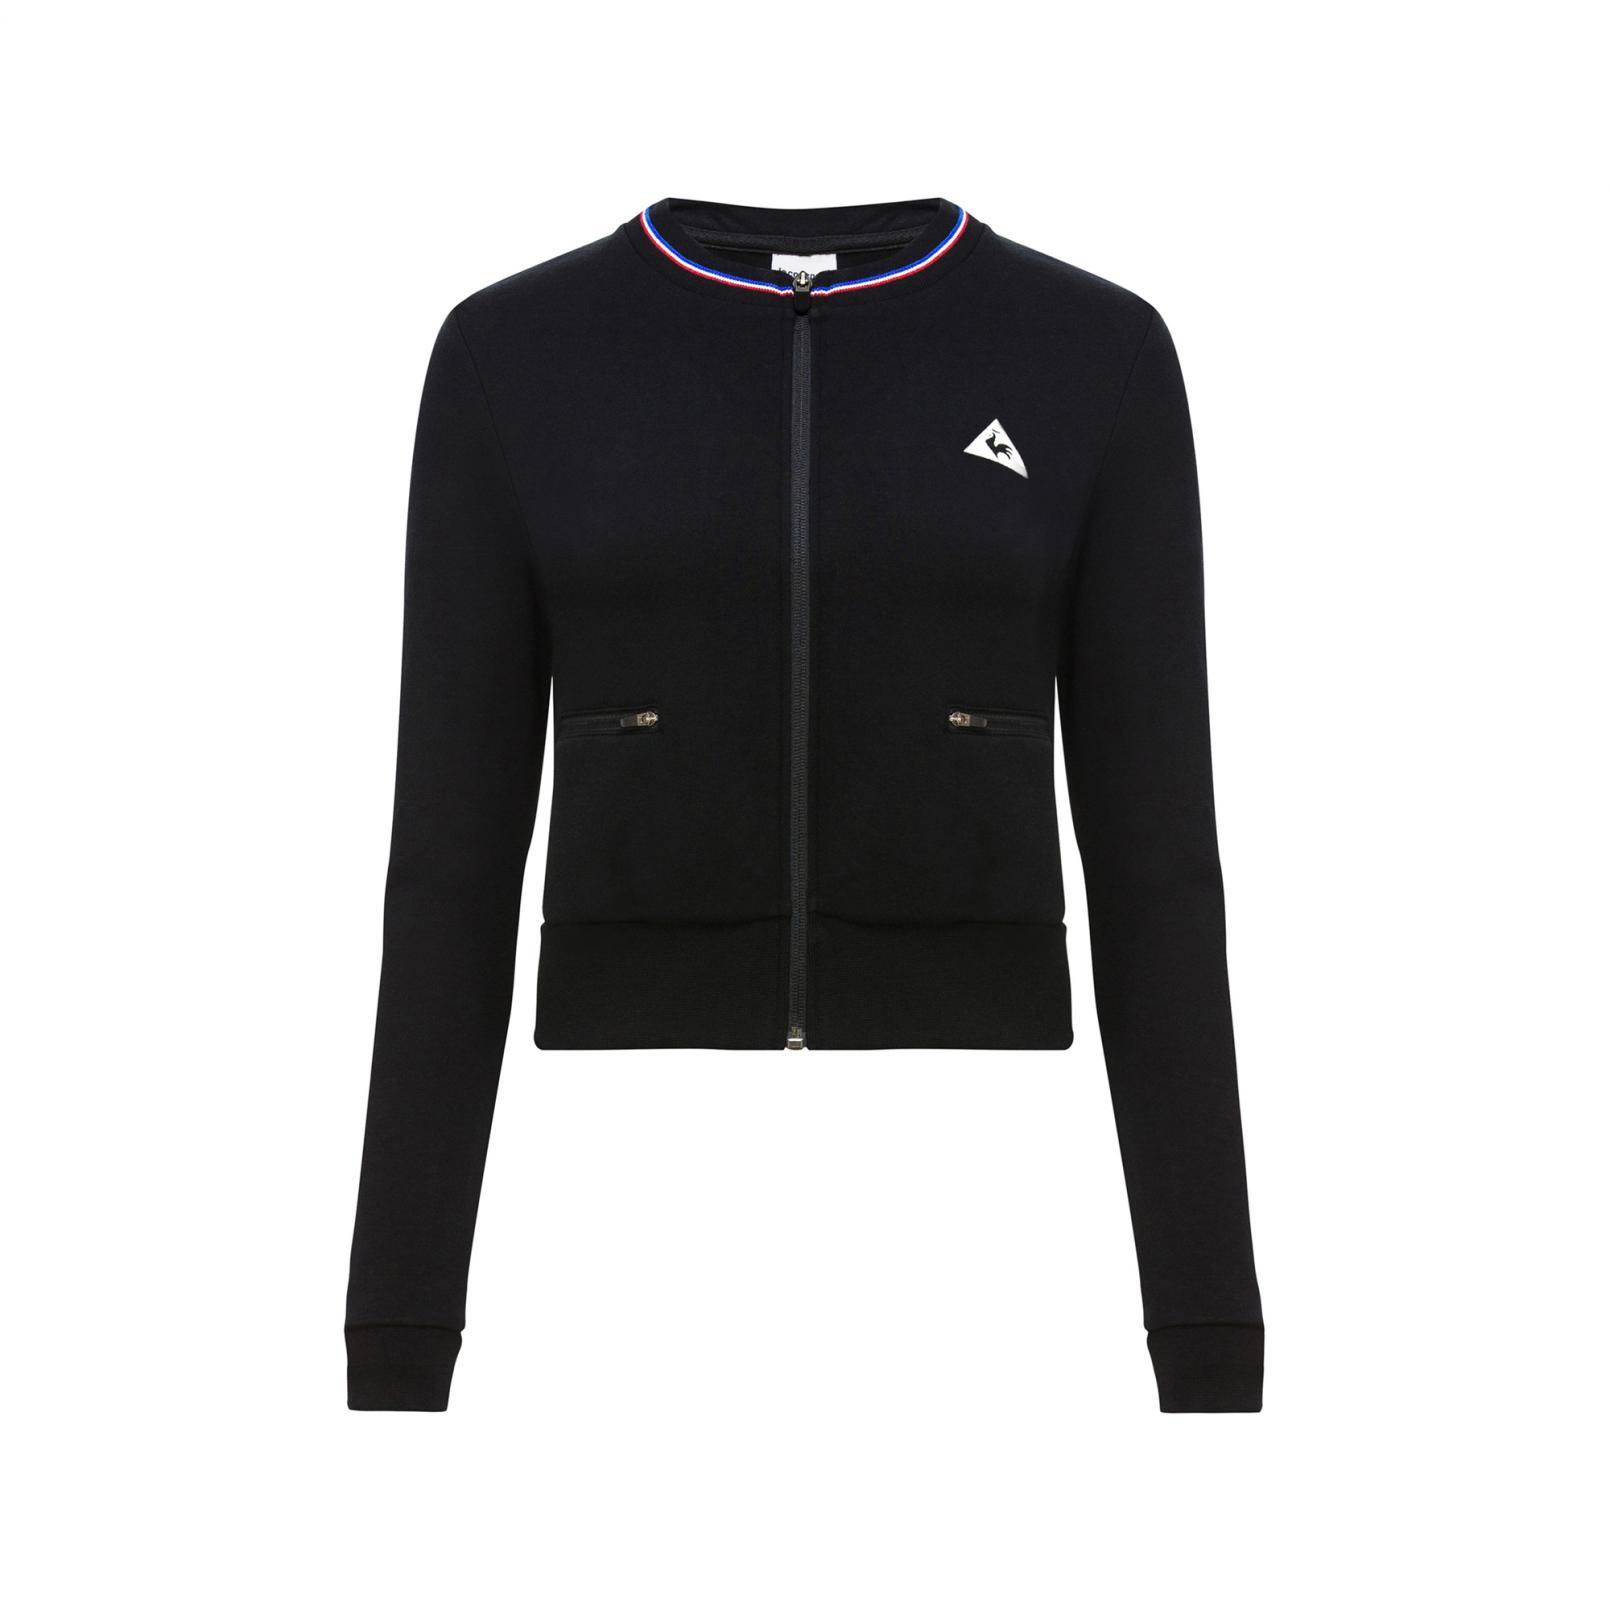 Tracktops & Jackets – Le Coq Sportif Tricolore Tracktop Black